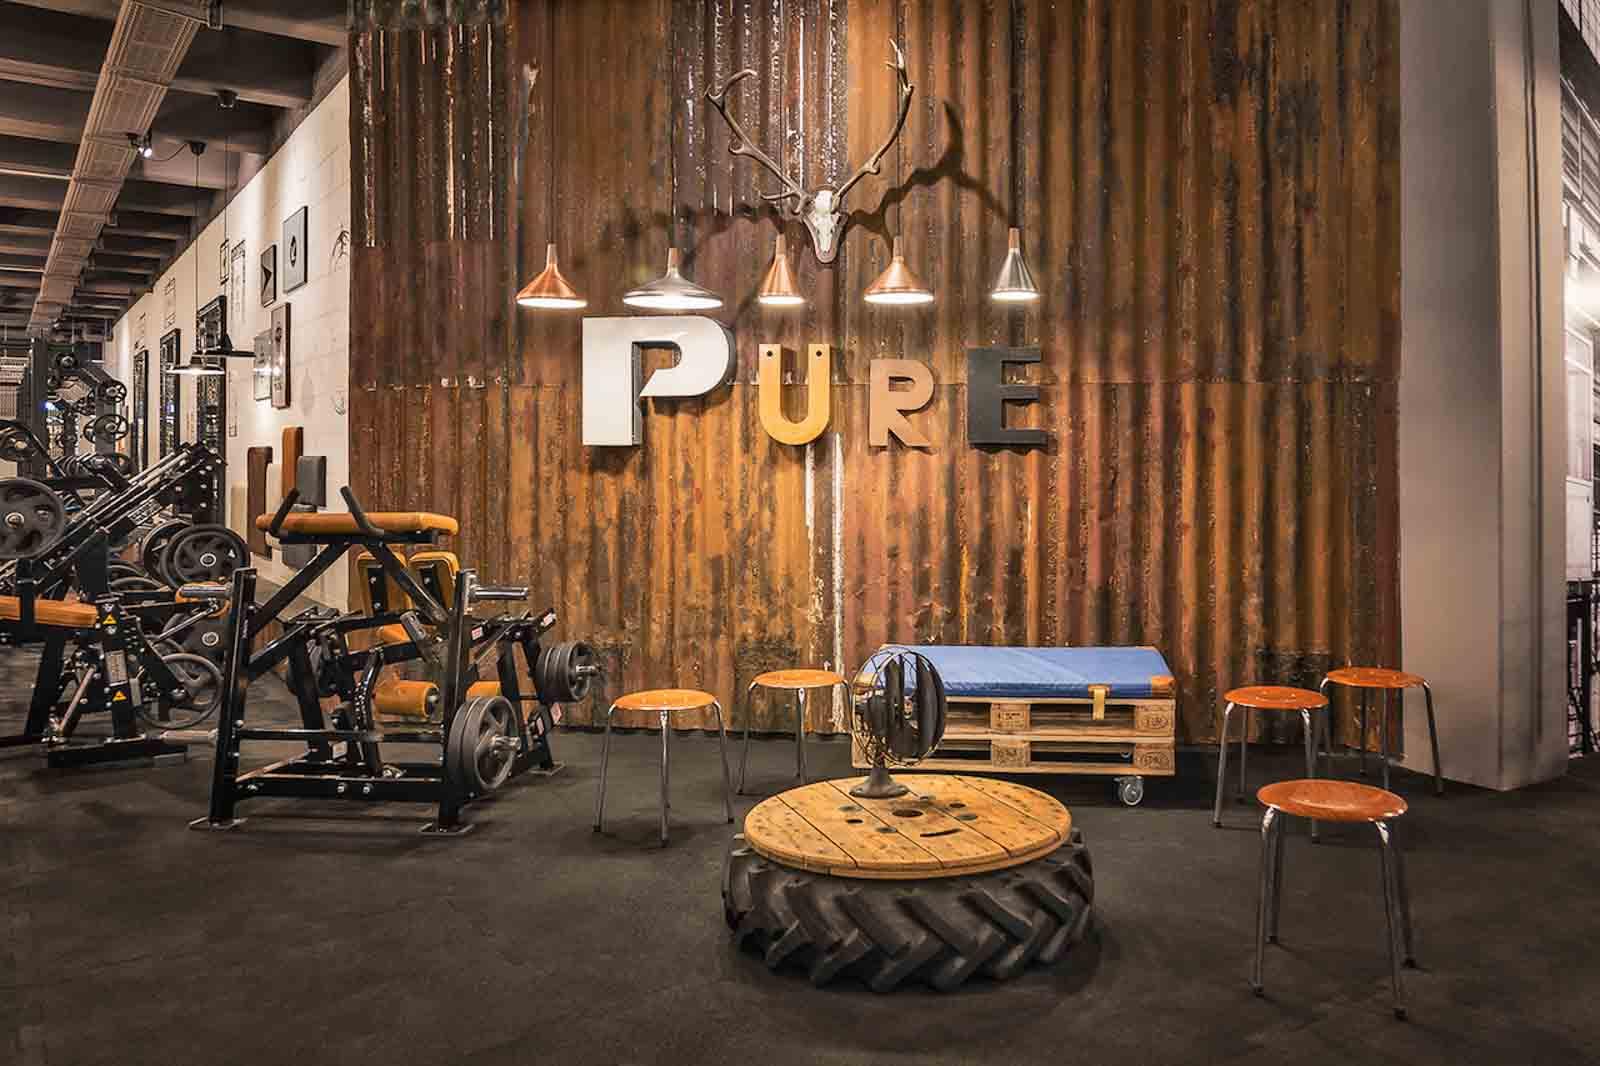 fotos fitnessstudio tammerfeld pure fitnessclub fitnessstudio in ludwigsburg. Black Bedroom Furniture Sets. Home Design Ideas